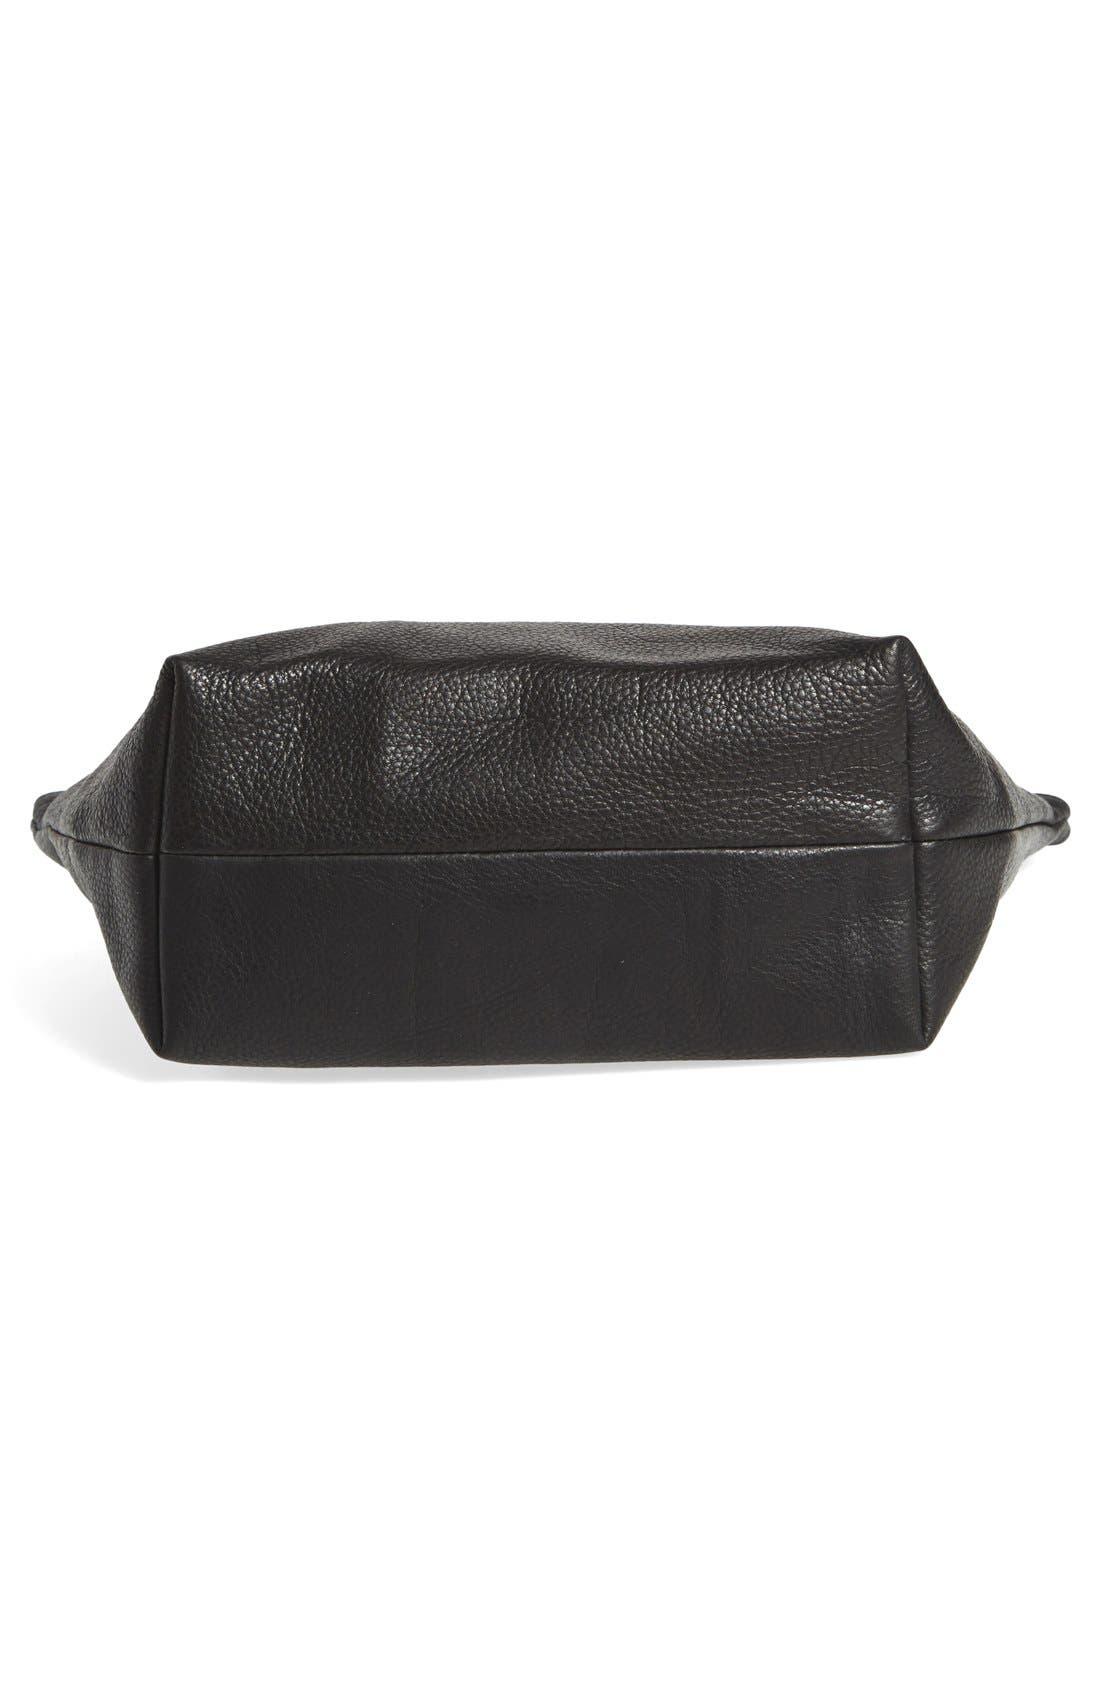 Large Leather Zip Pouch,                             Alternate thumbnail 5, color,                             001